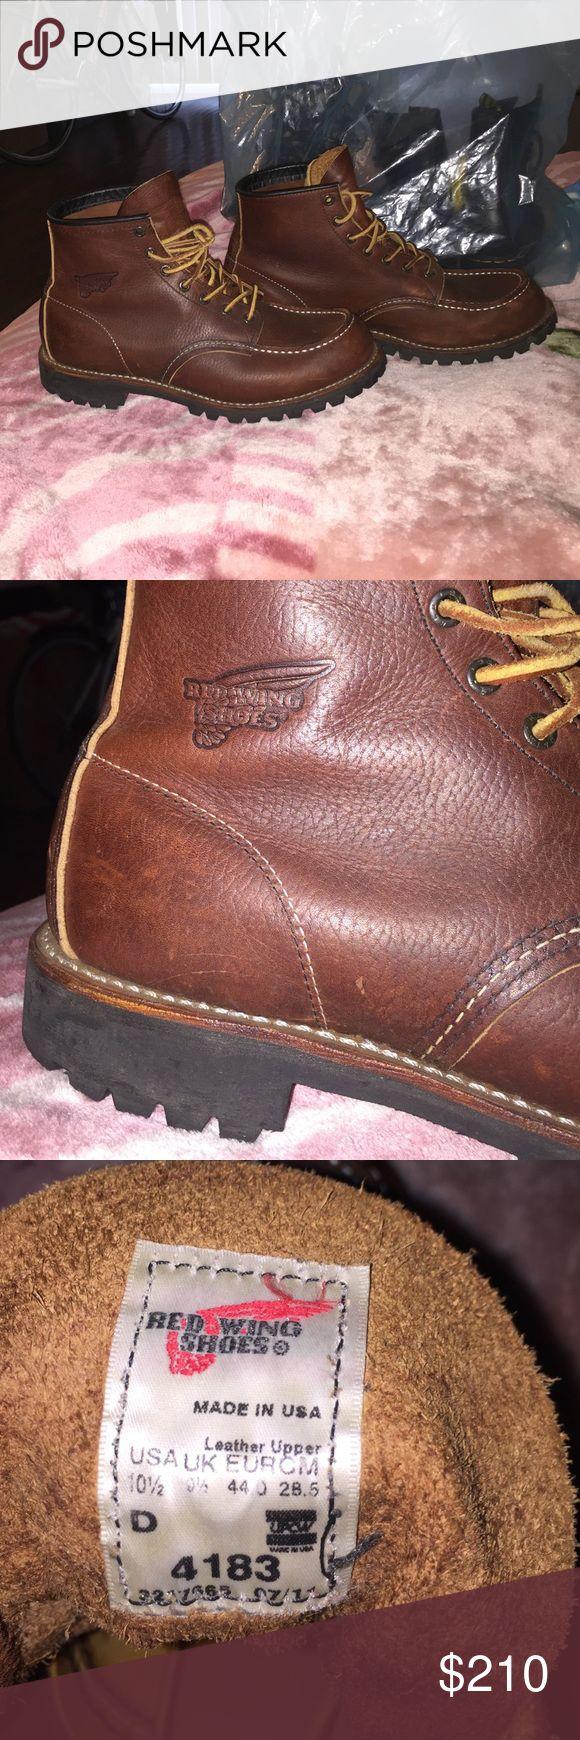 21 best boots images on Pinterest